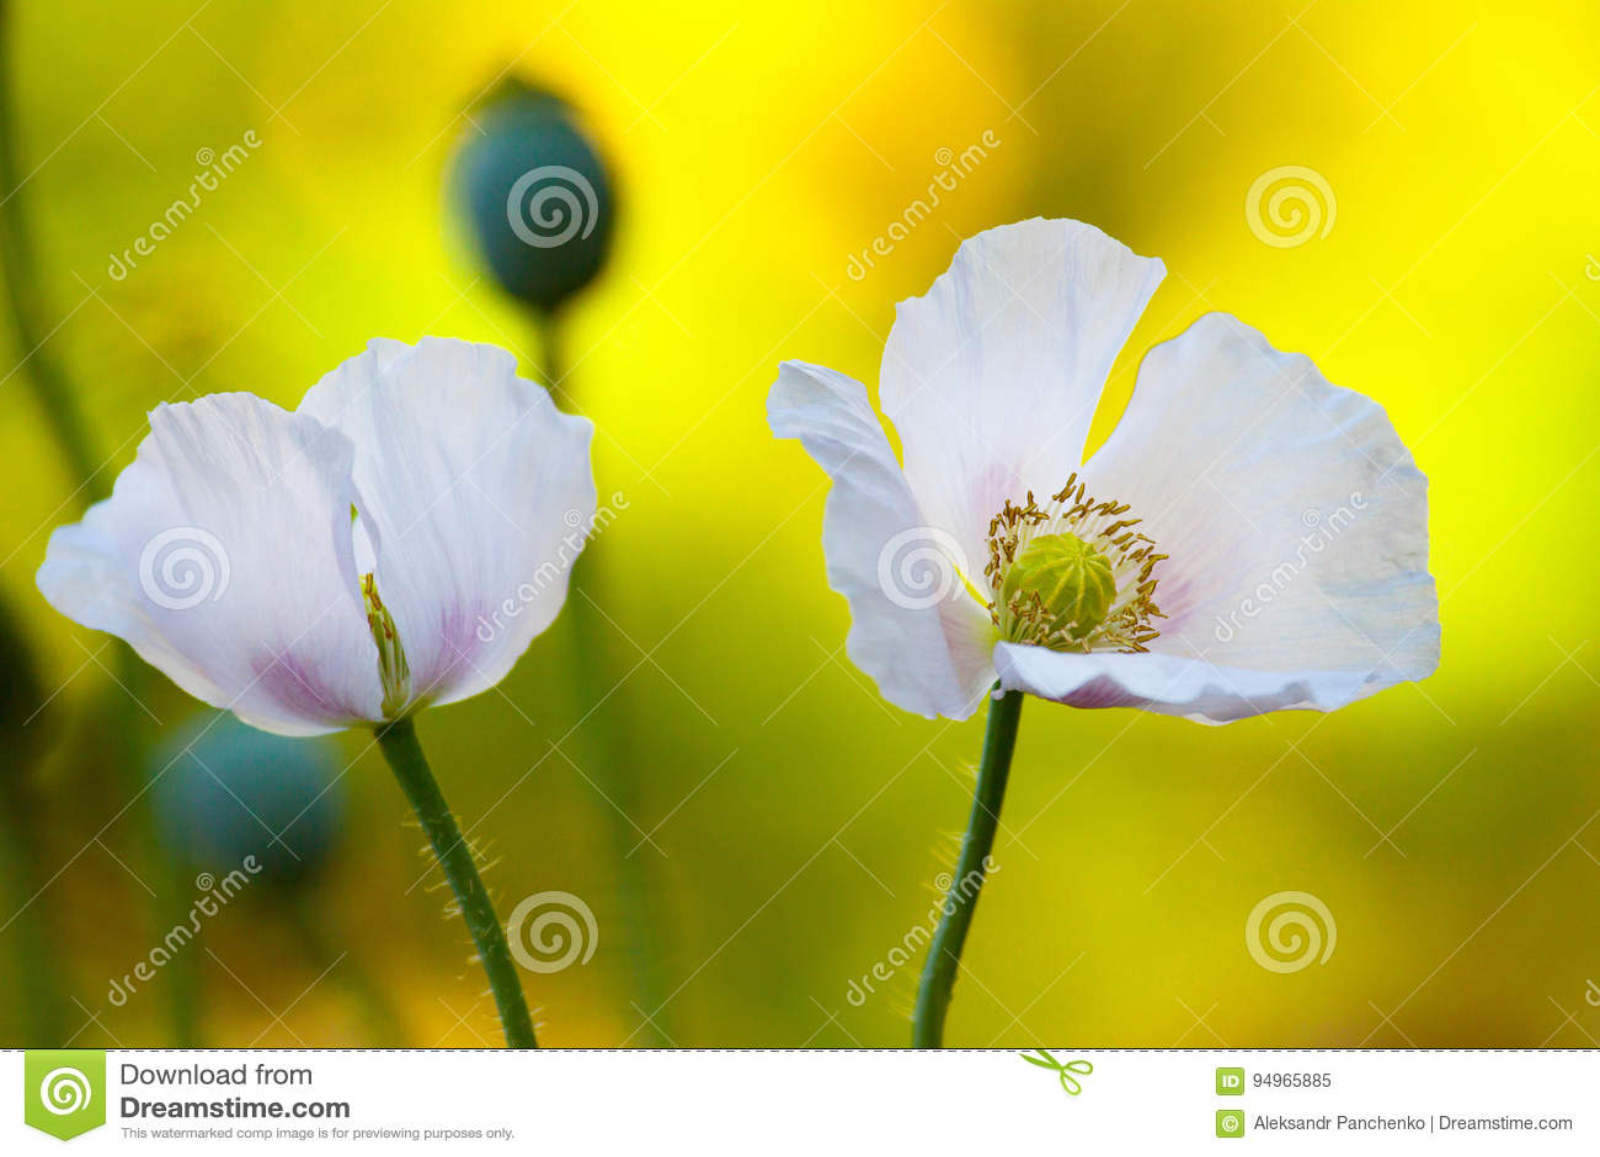 Opium Poppy Flowers Stock Image Image Of Garden Herb 94965885